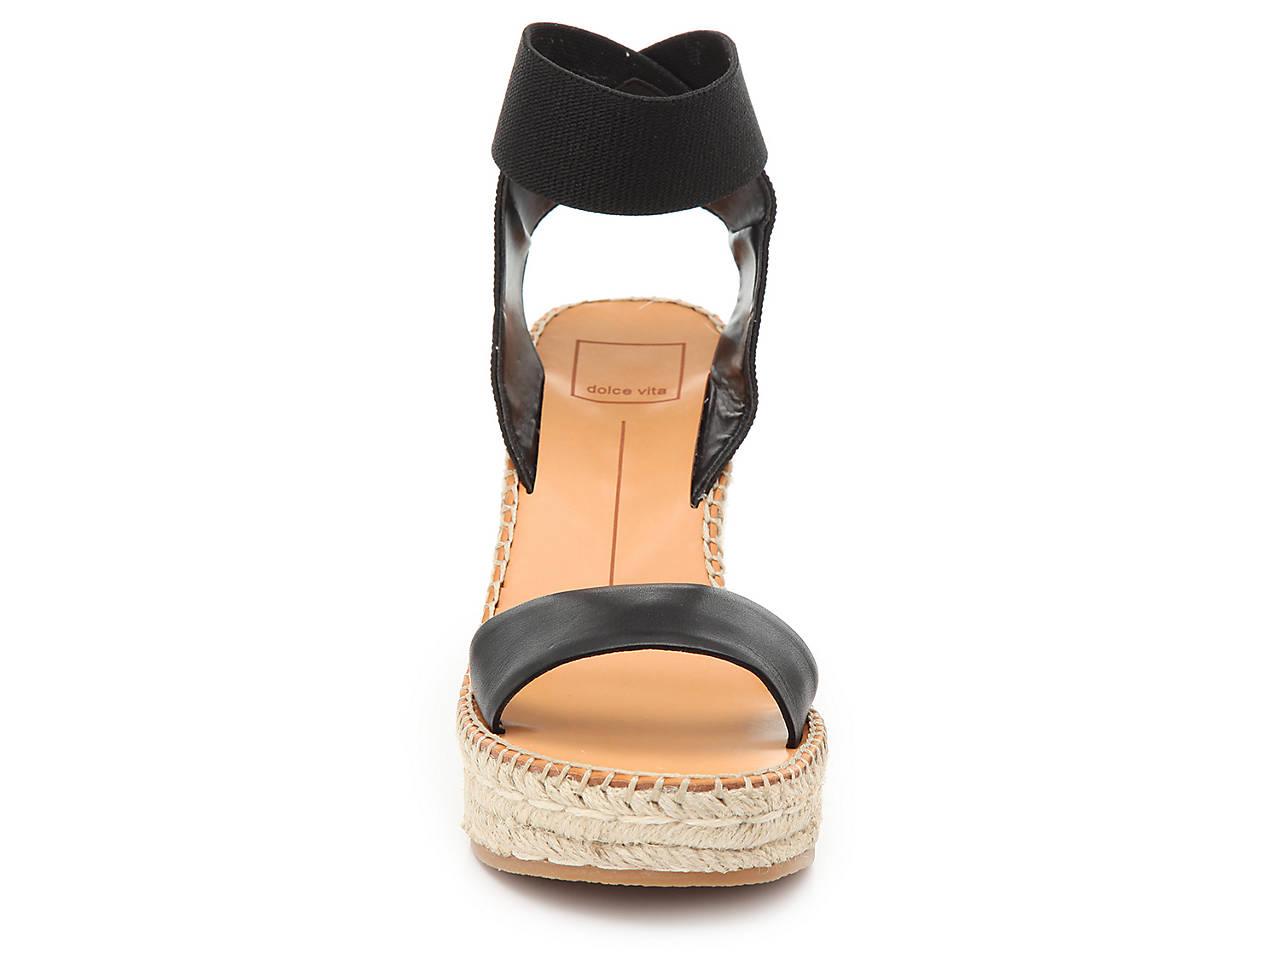 3613a323408 Dolce Vita Pavlin Espadrille Wedge Sandal Women s Shoes